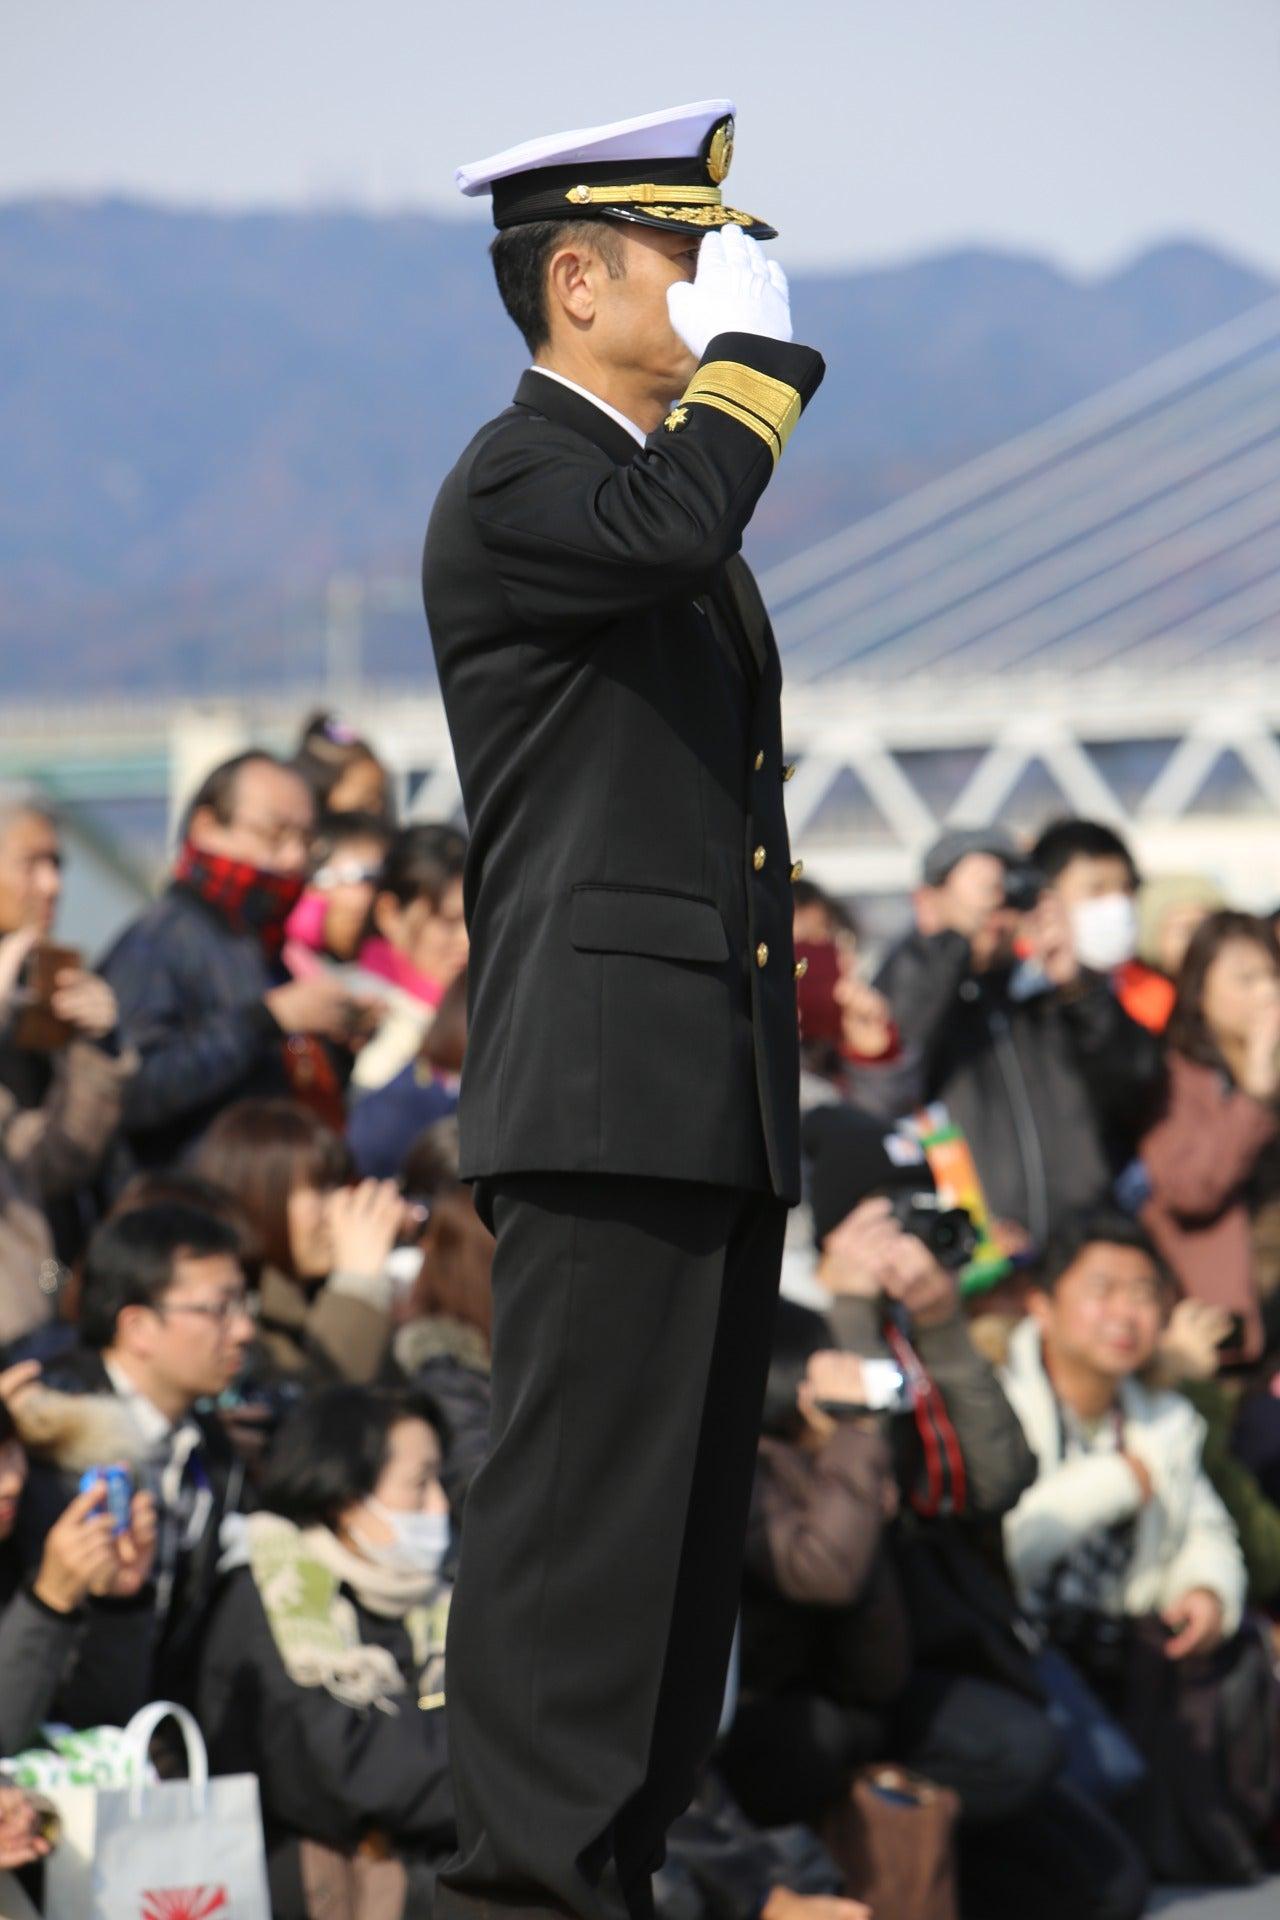 Let's begin!海自・護衛艦「しまかぜ」(DDG-172)艦艇広報・阪神基地隊・12/10・・・その4